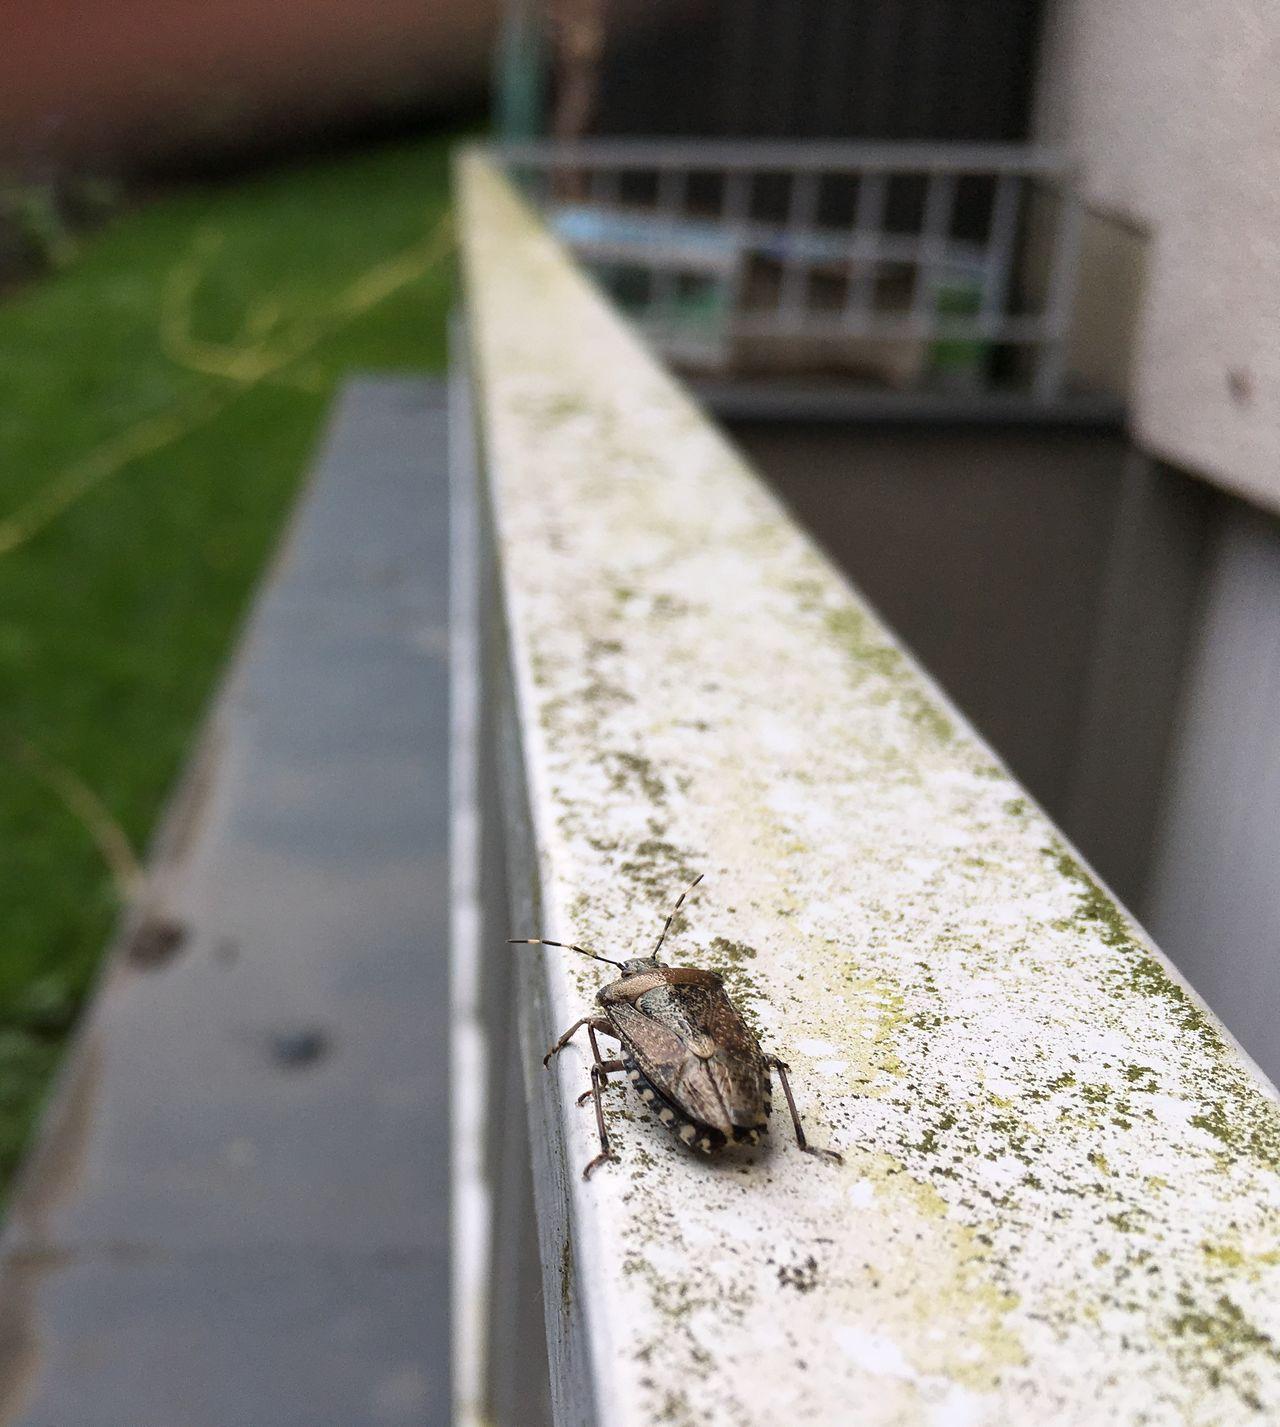 Long way Animal Themes Animal Wildlife Bug Ceiling Close-up Garden Hand Rail Insect One Animal Outdoors Stink Bug Stinkbug